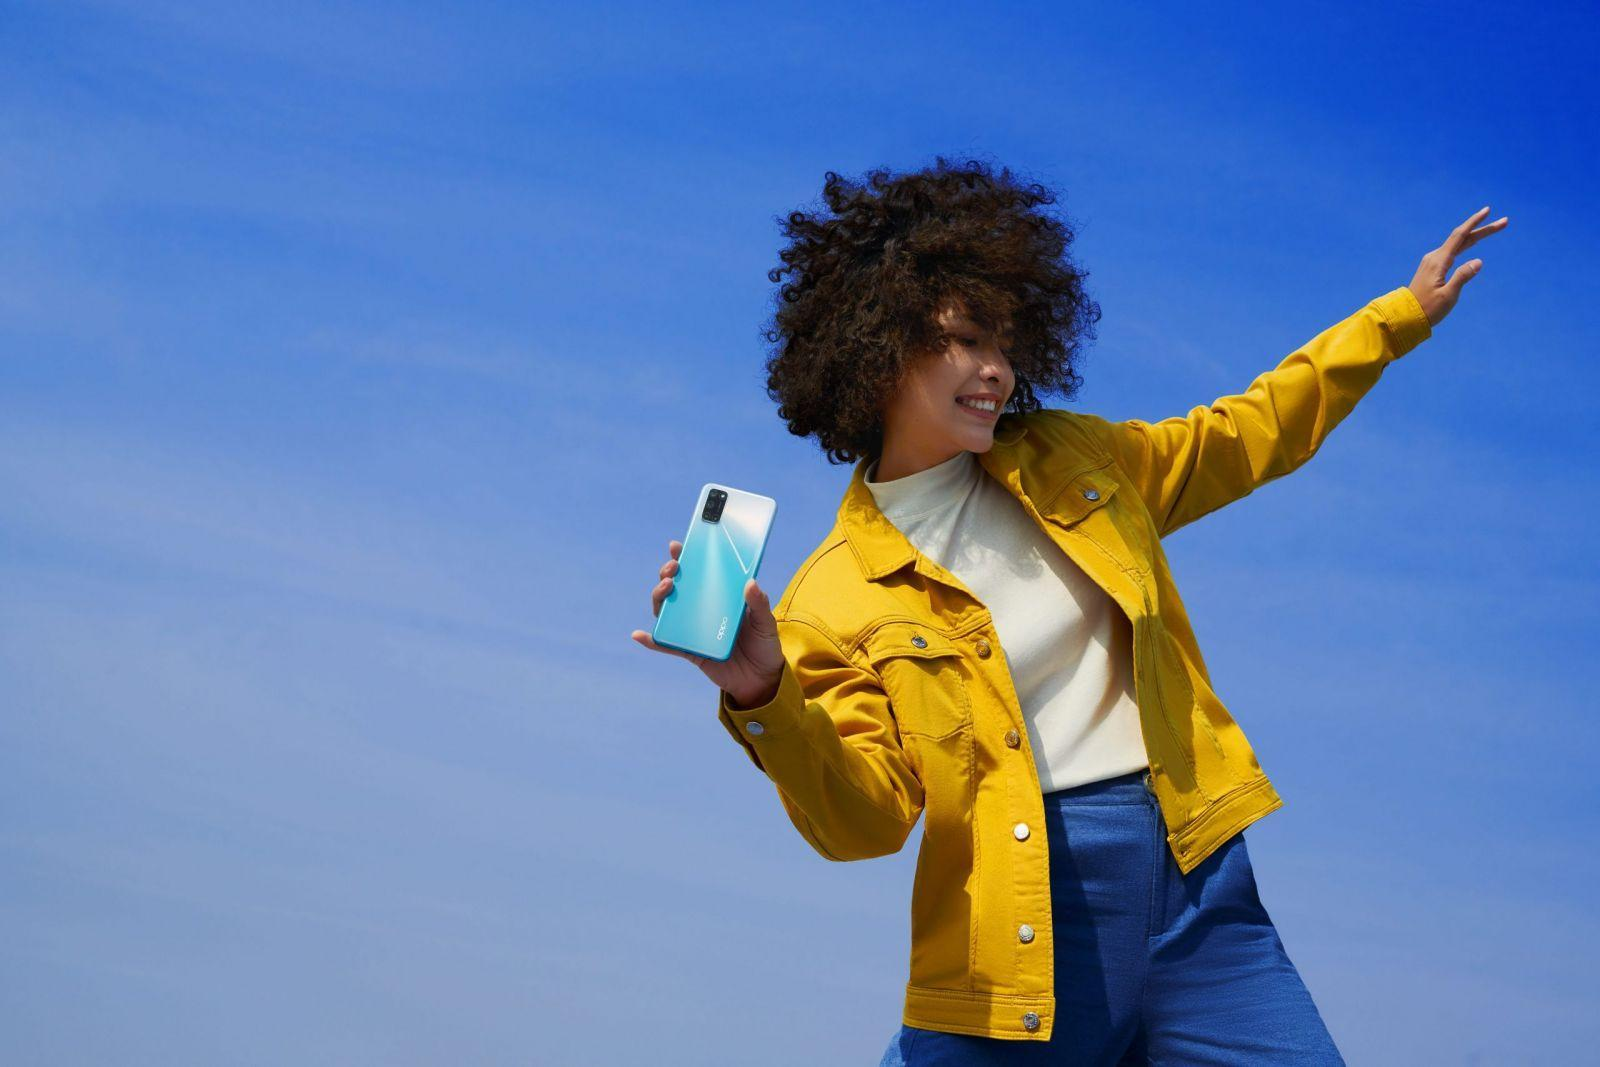 OPPO выпустила недорогой смартфон OPPO A72 с мощным аккумулятором (a72 scenario pictures 1 scaled)